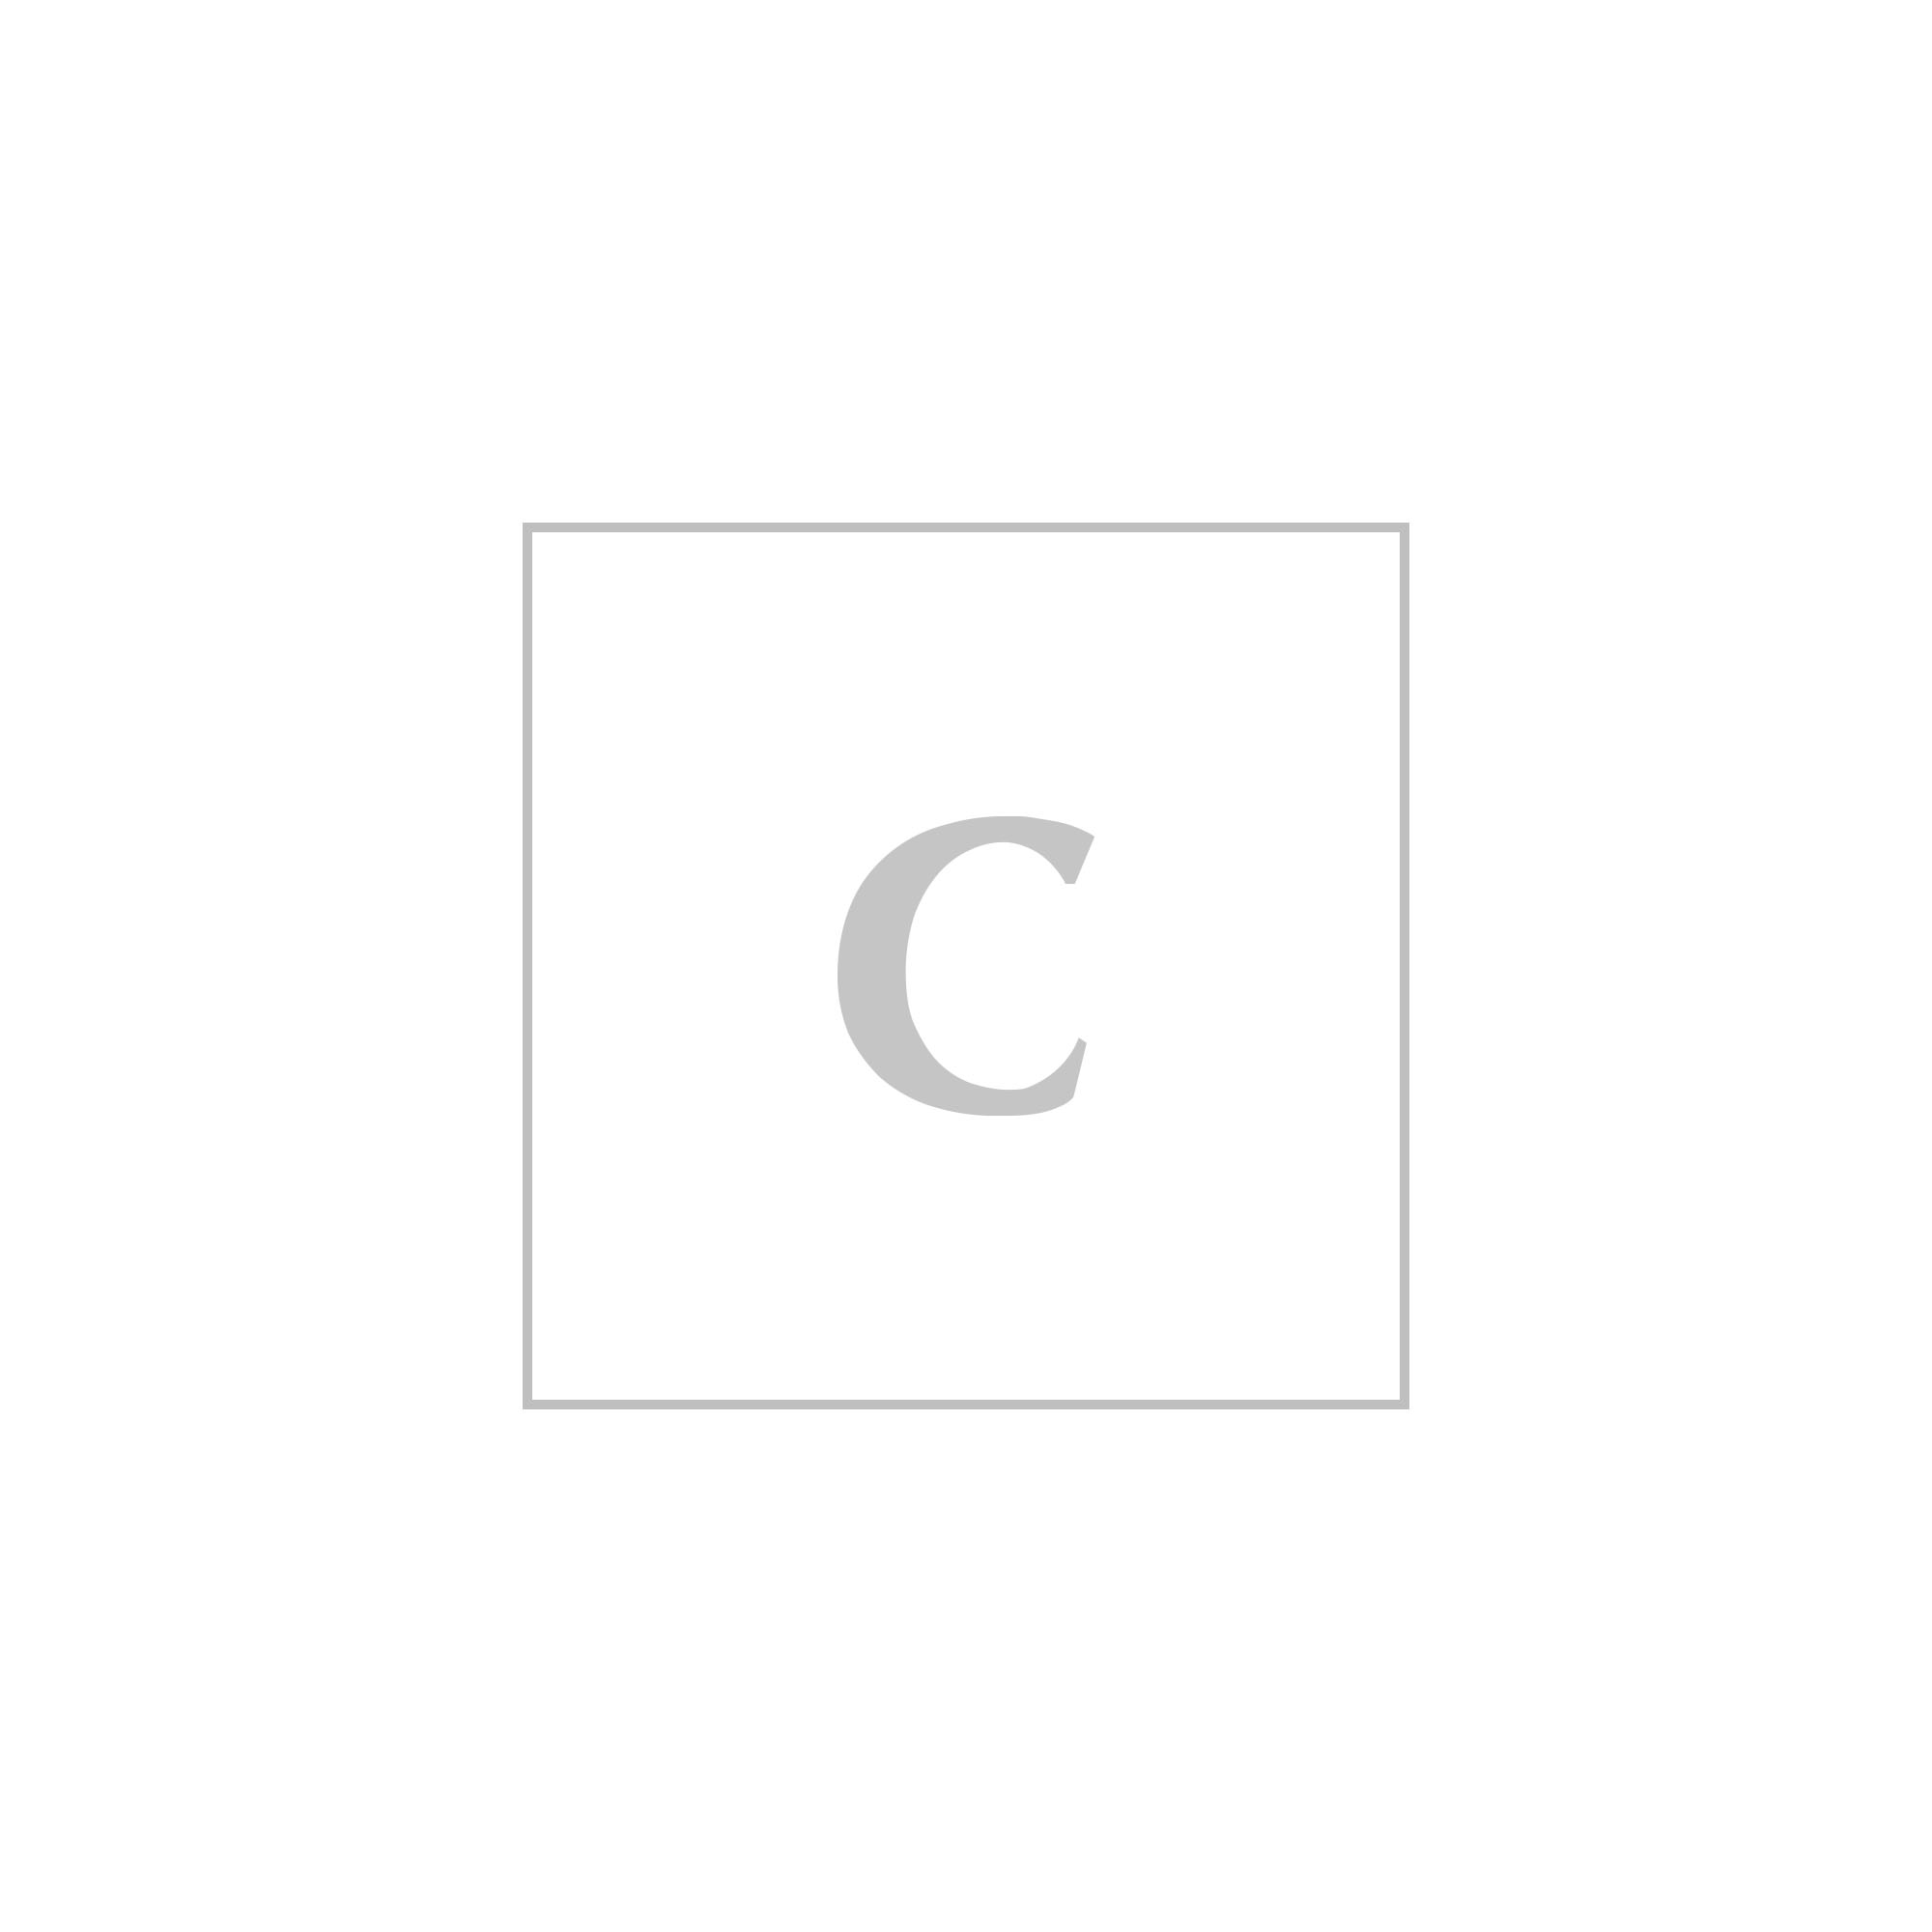 Dolce & gabbana borsa sicily media stampa pied de poule